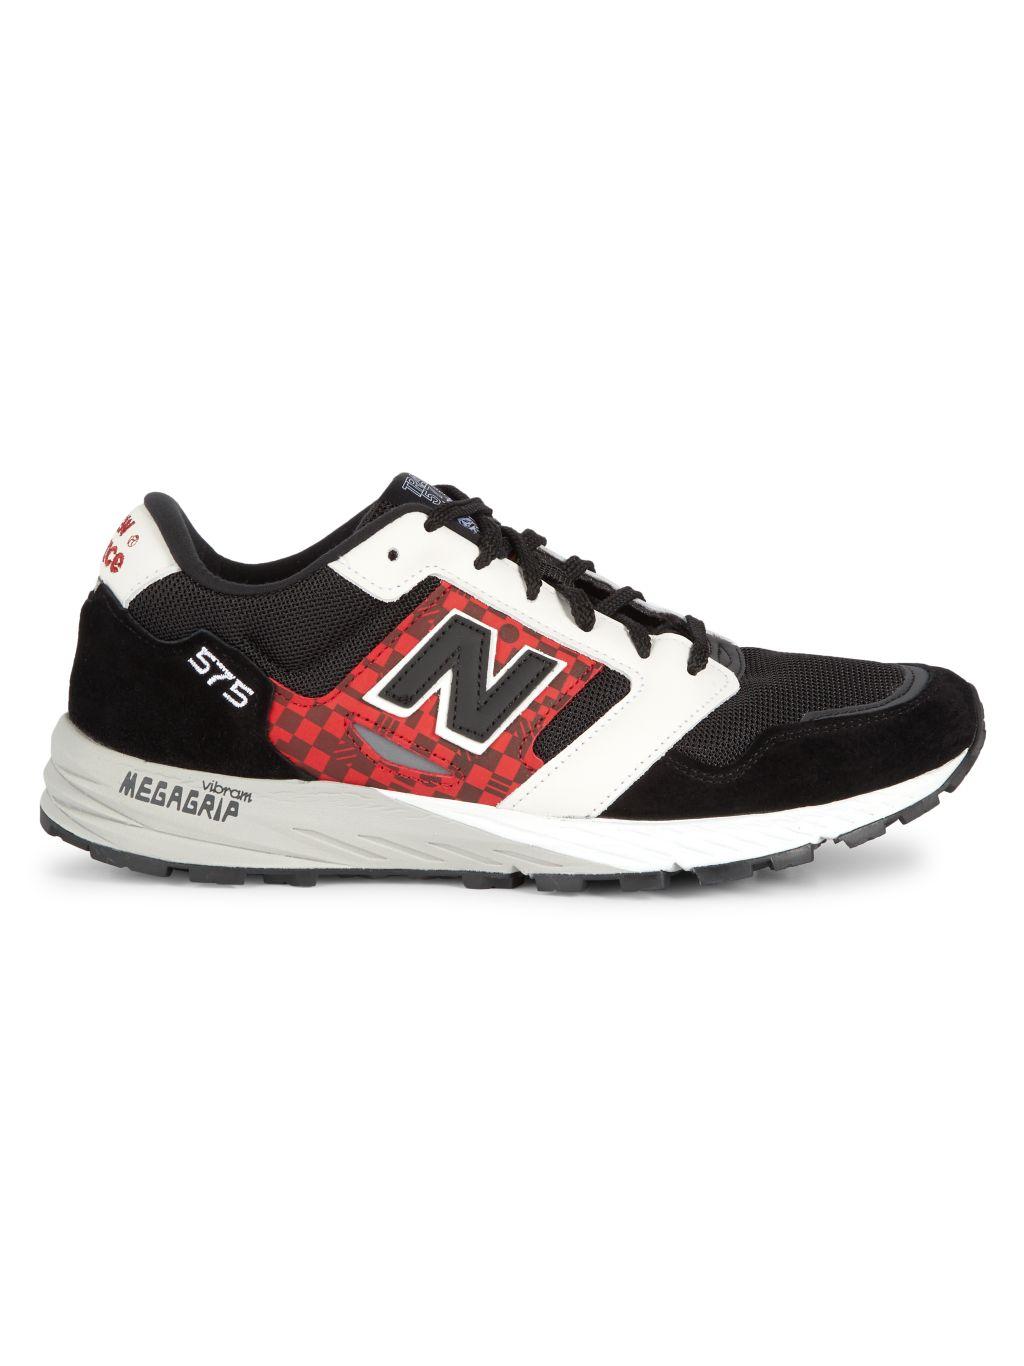 New Balance MTL575 Sneakers